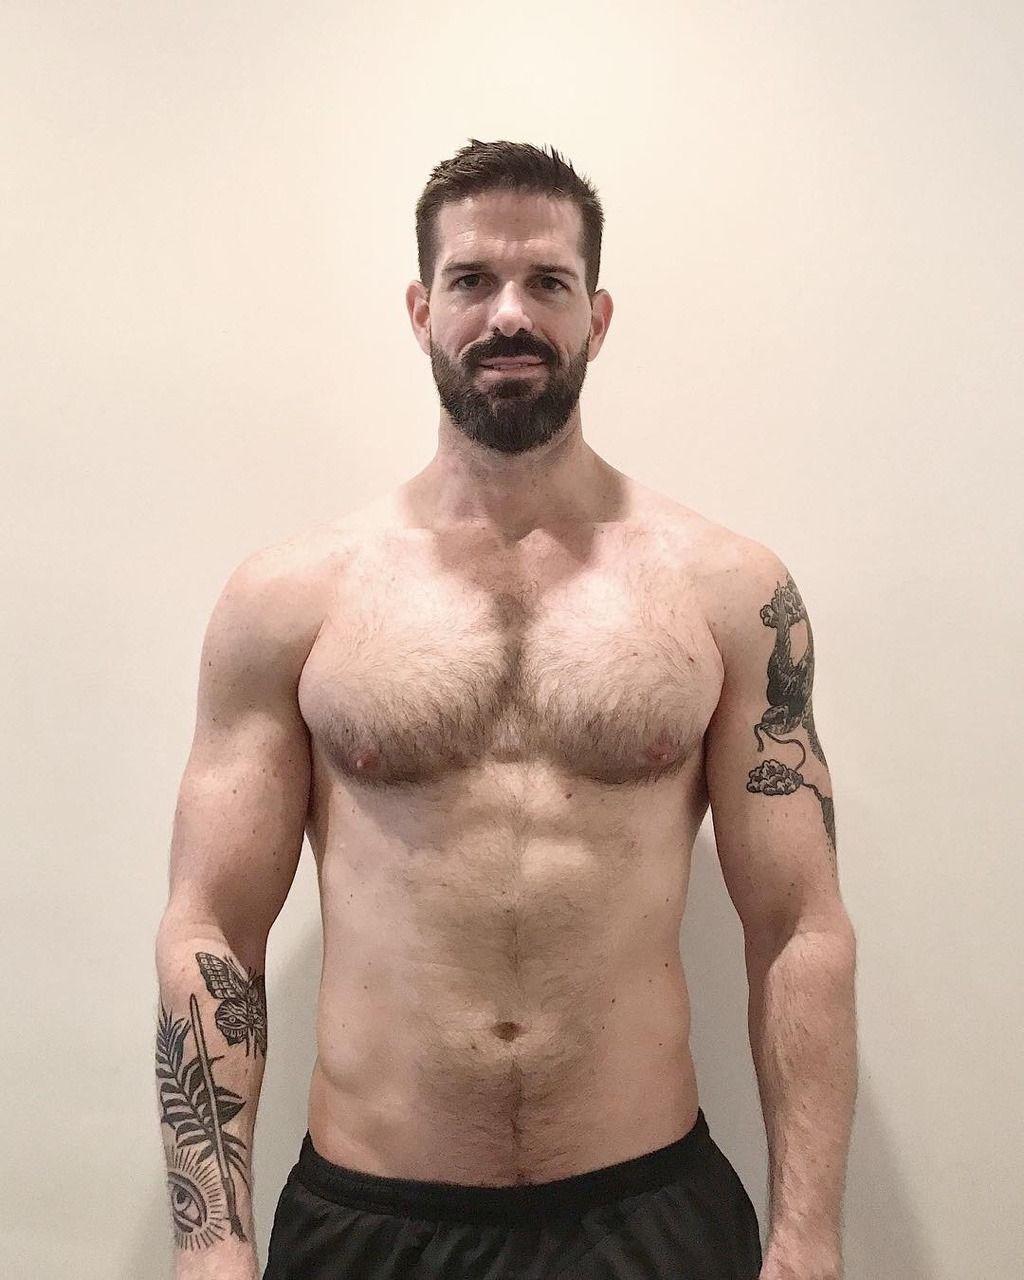 pinibnu mulkan on mix | pinterest | hot guys, sexy men and hairy men